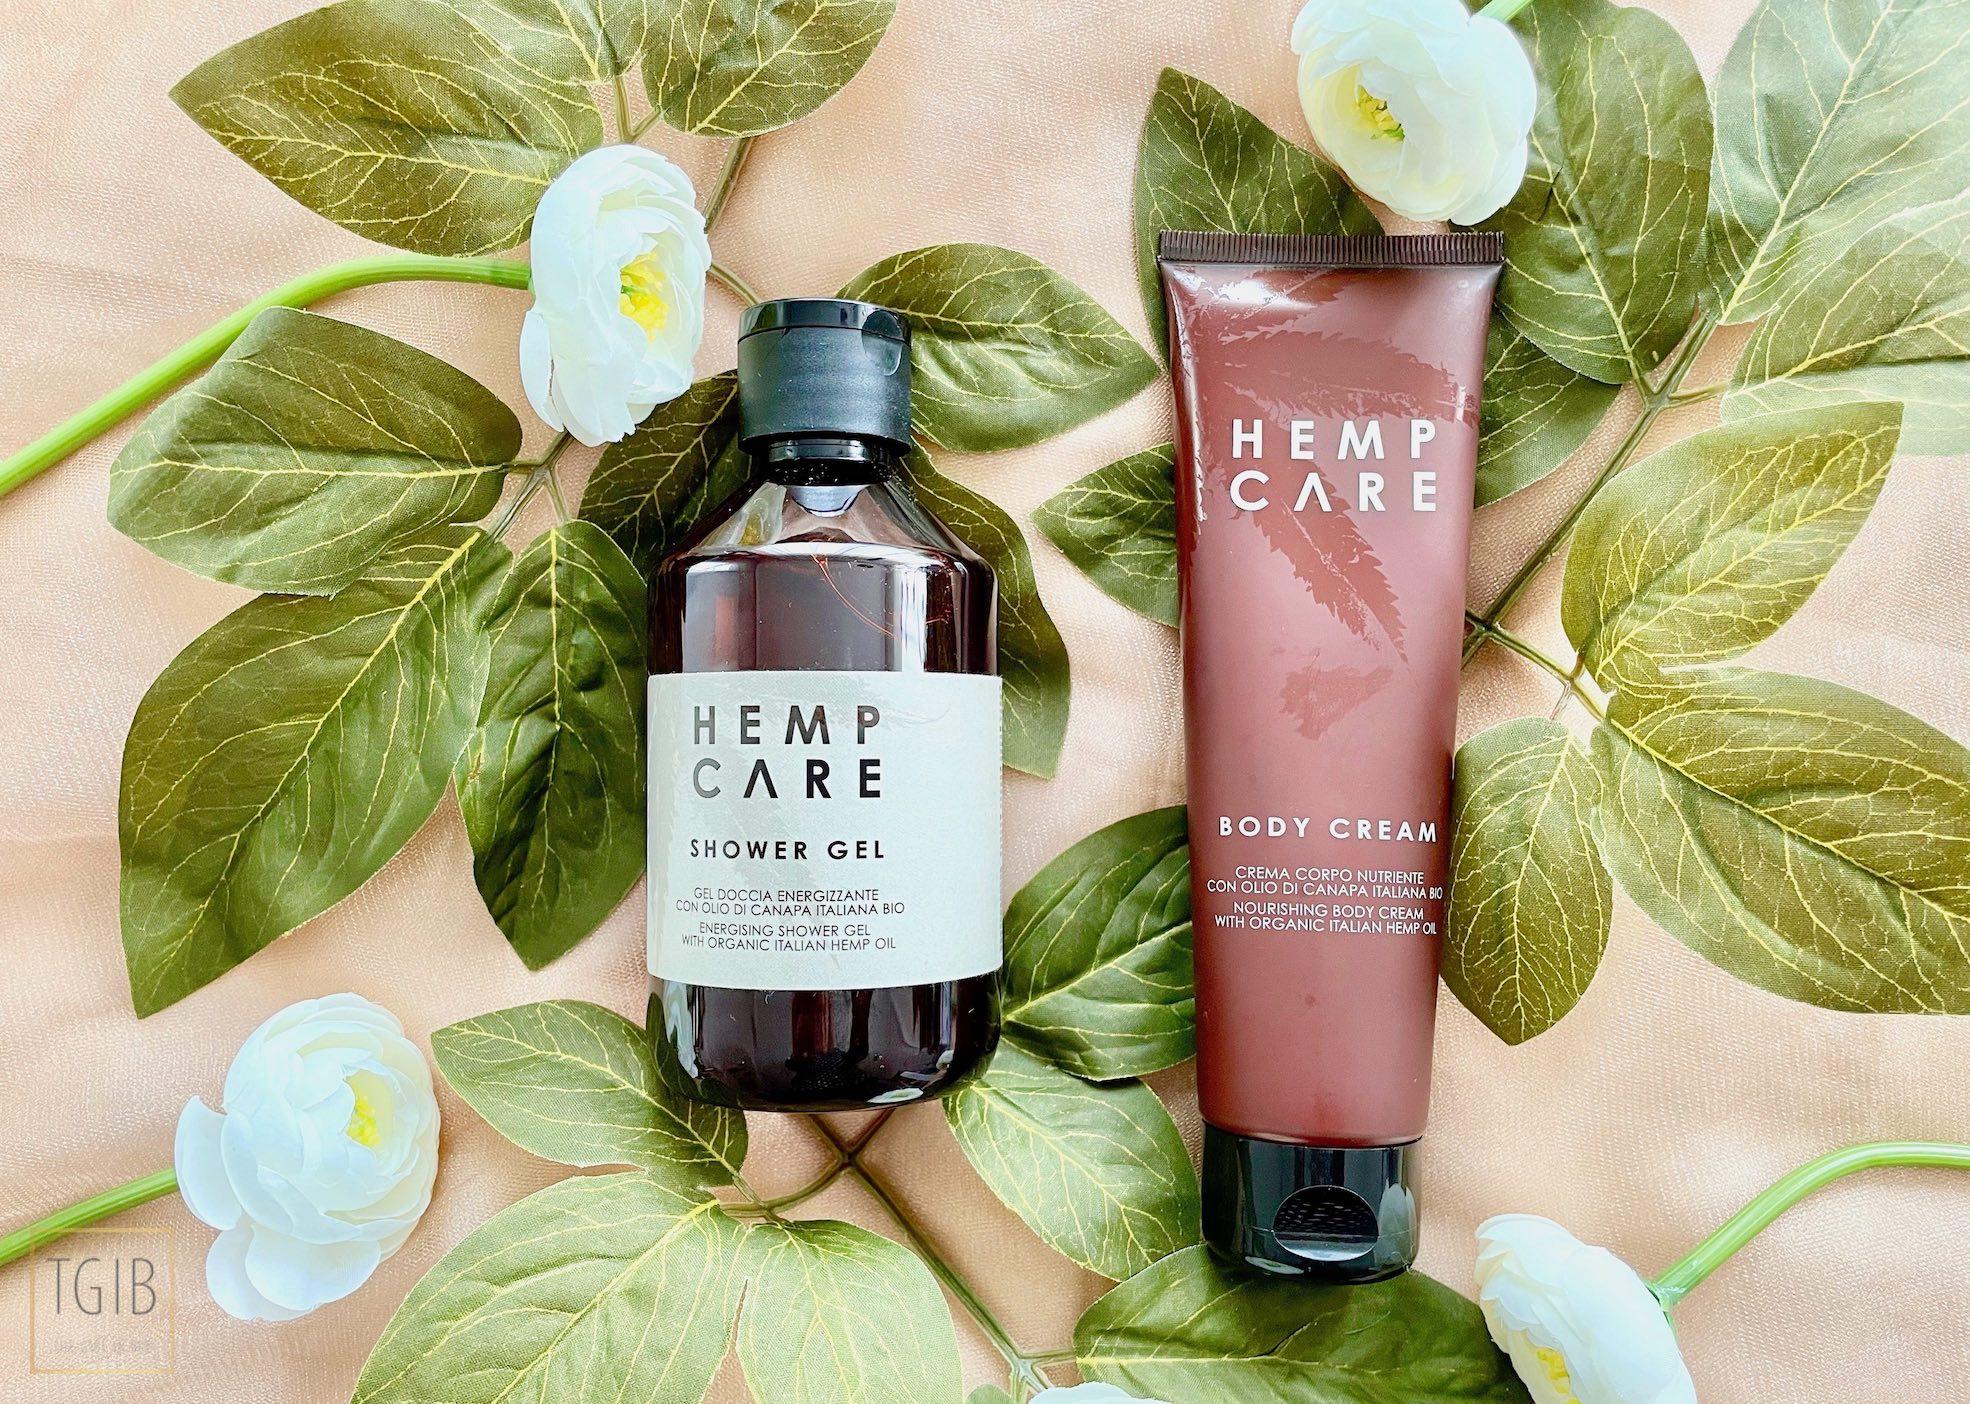 Hemp Care Shower Gel & Body Cream Review